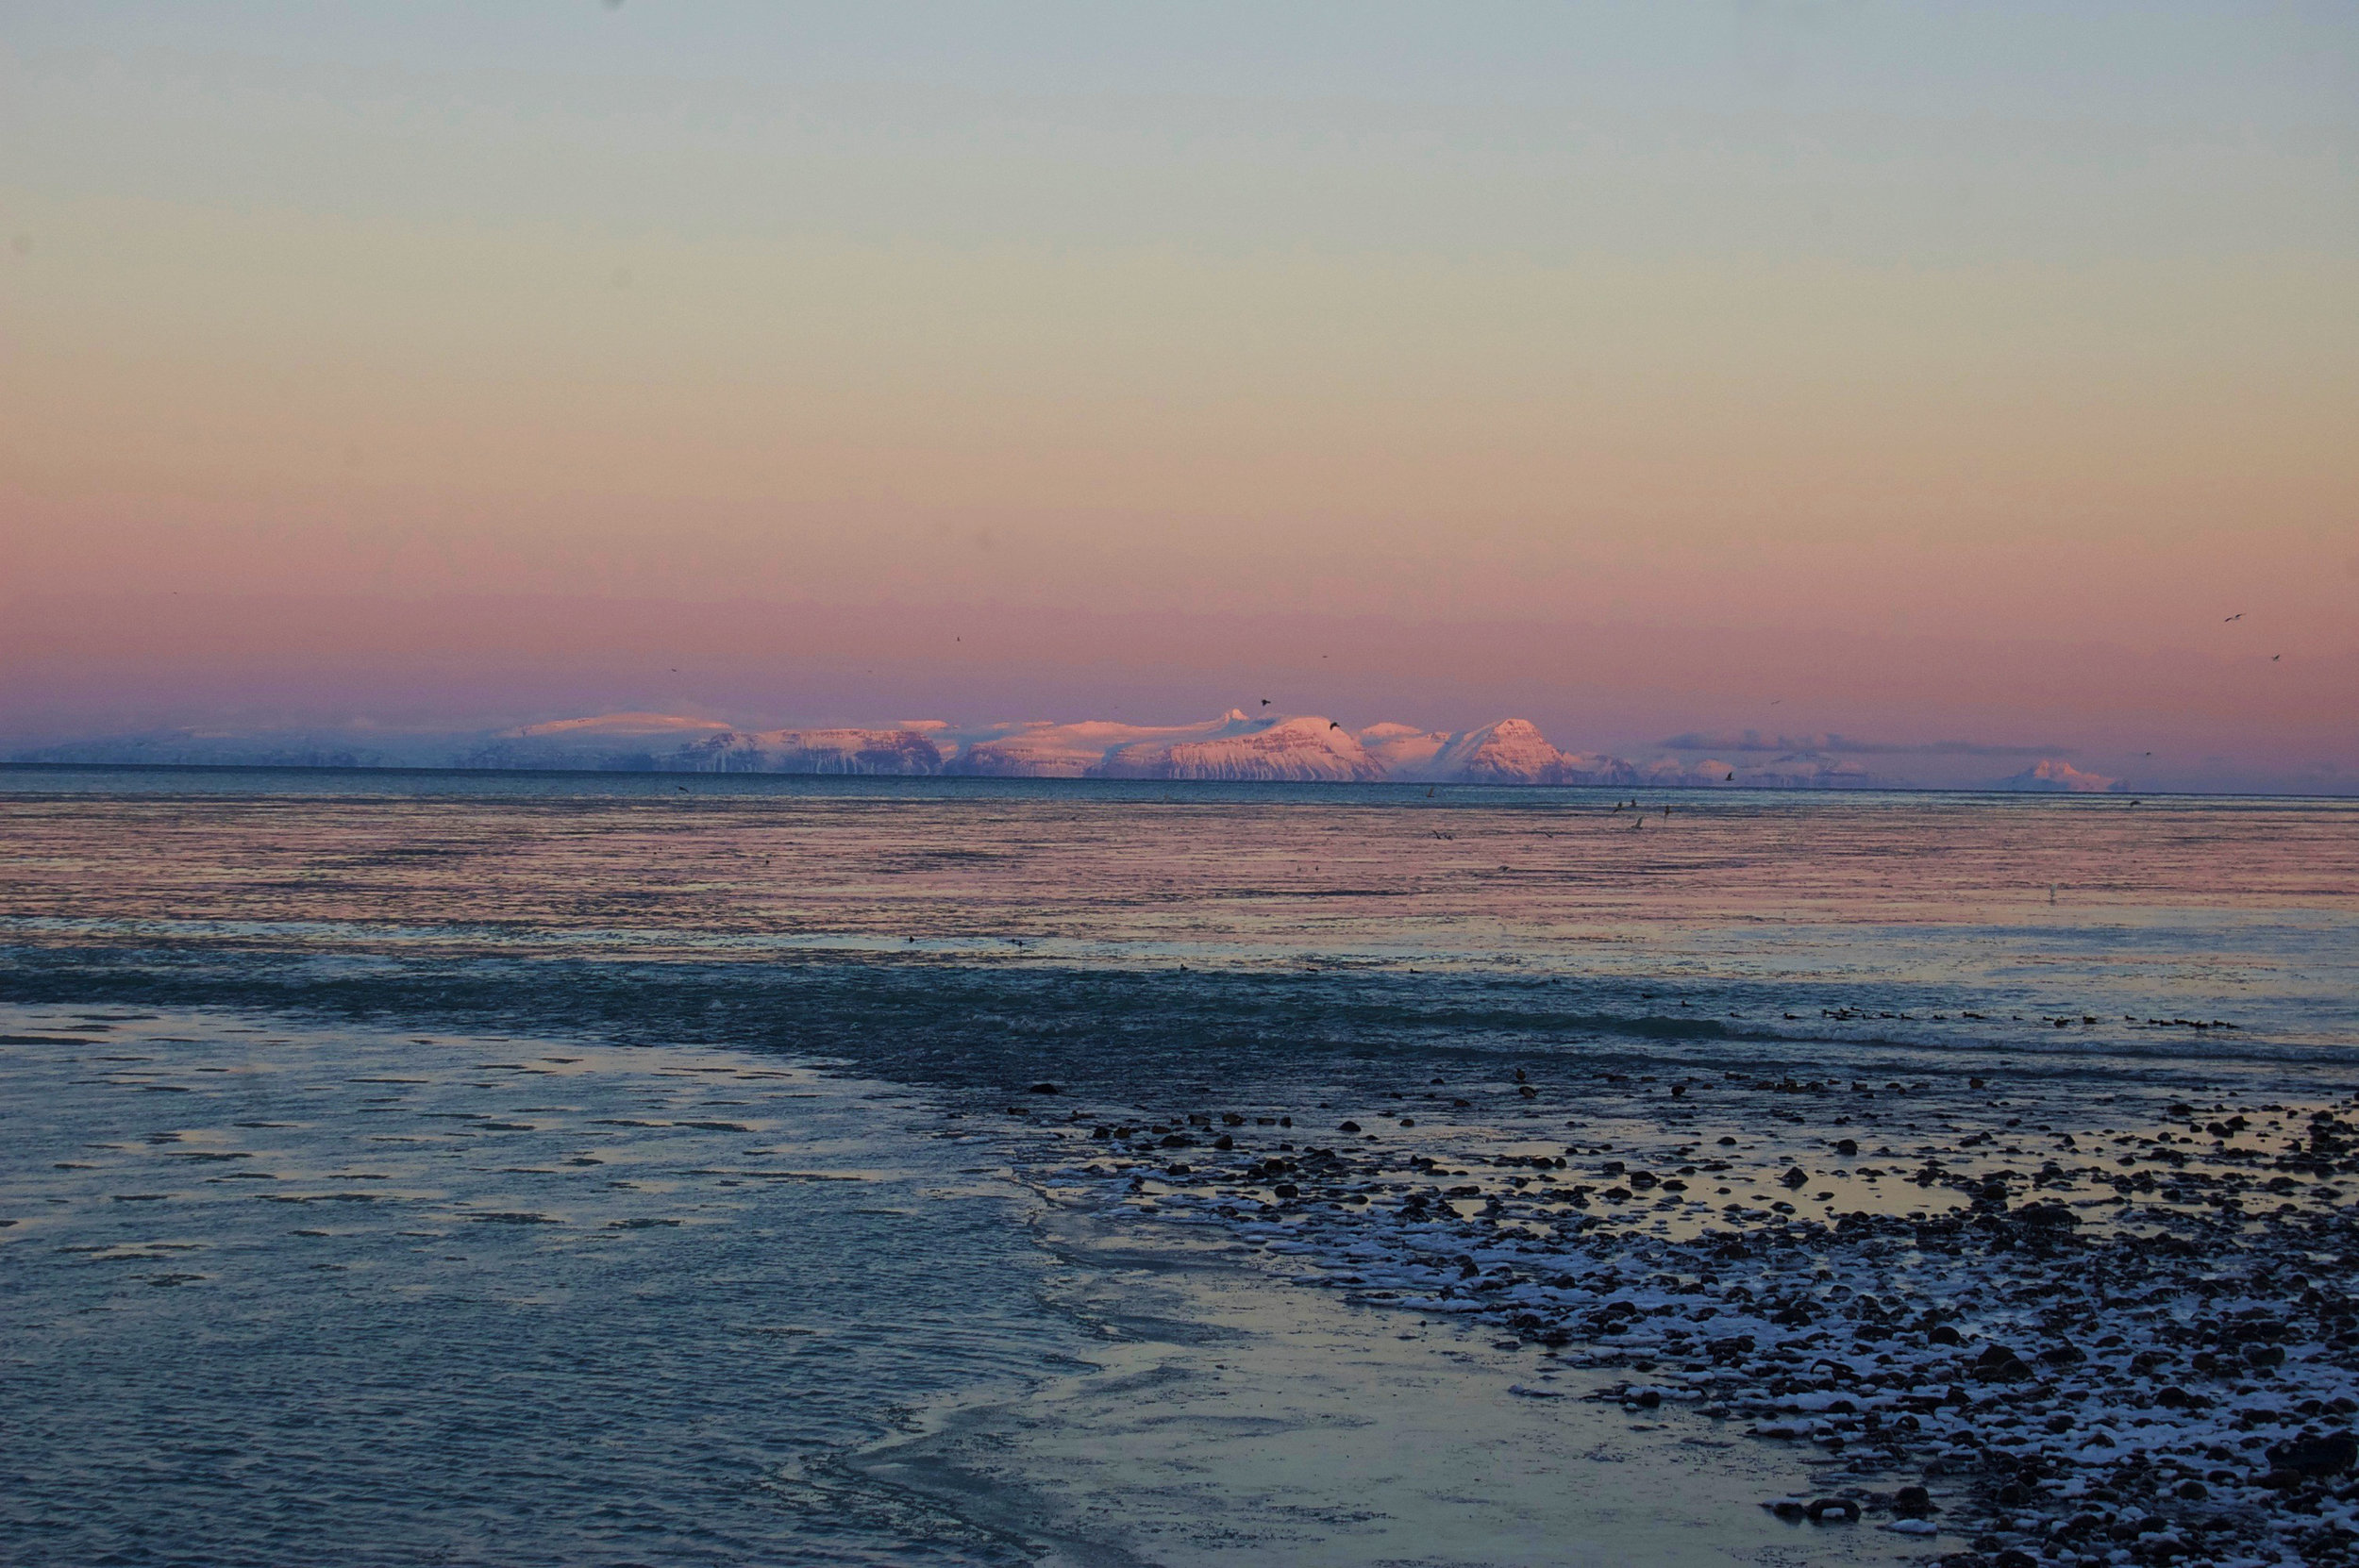 Sun reflecting off the glaciers as it rises -Blönduós, Iceland.